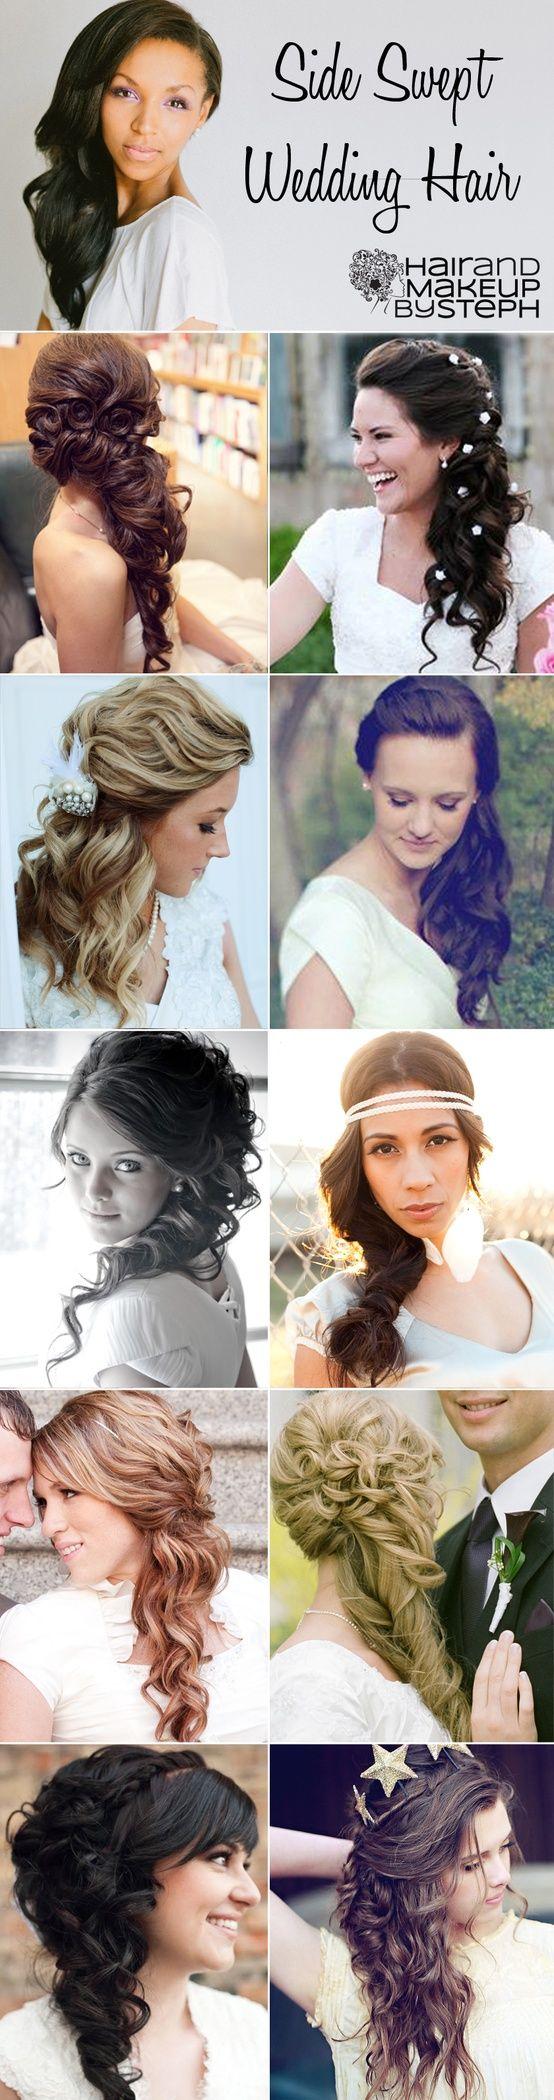 Side wedding hair ideas amanda snelson simmons if i ever say i